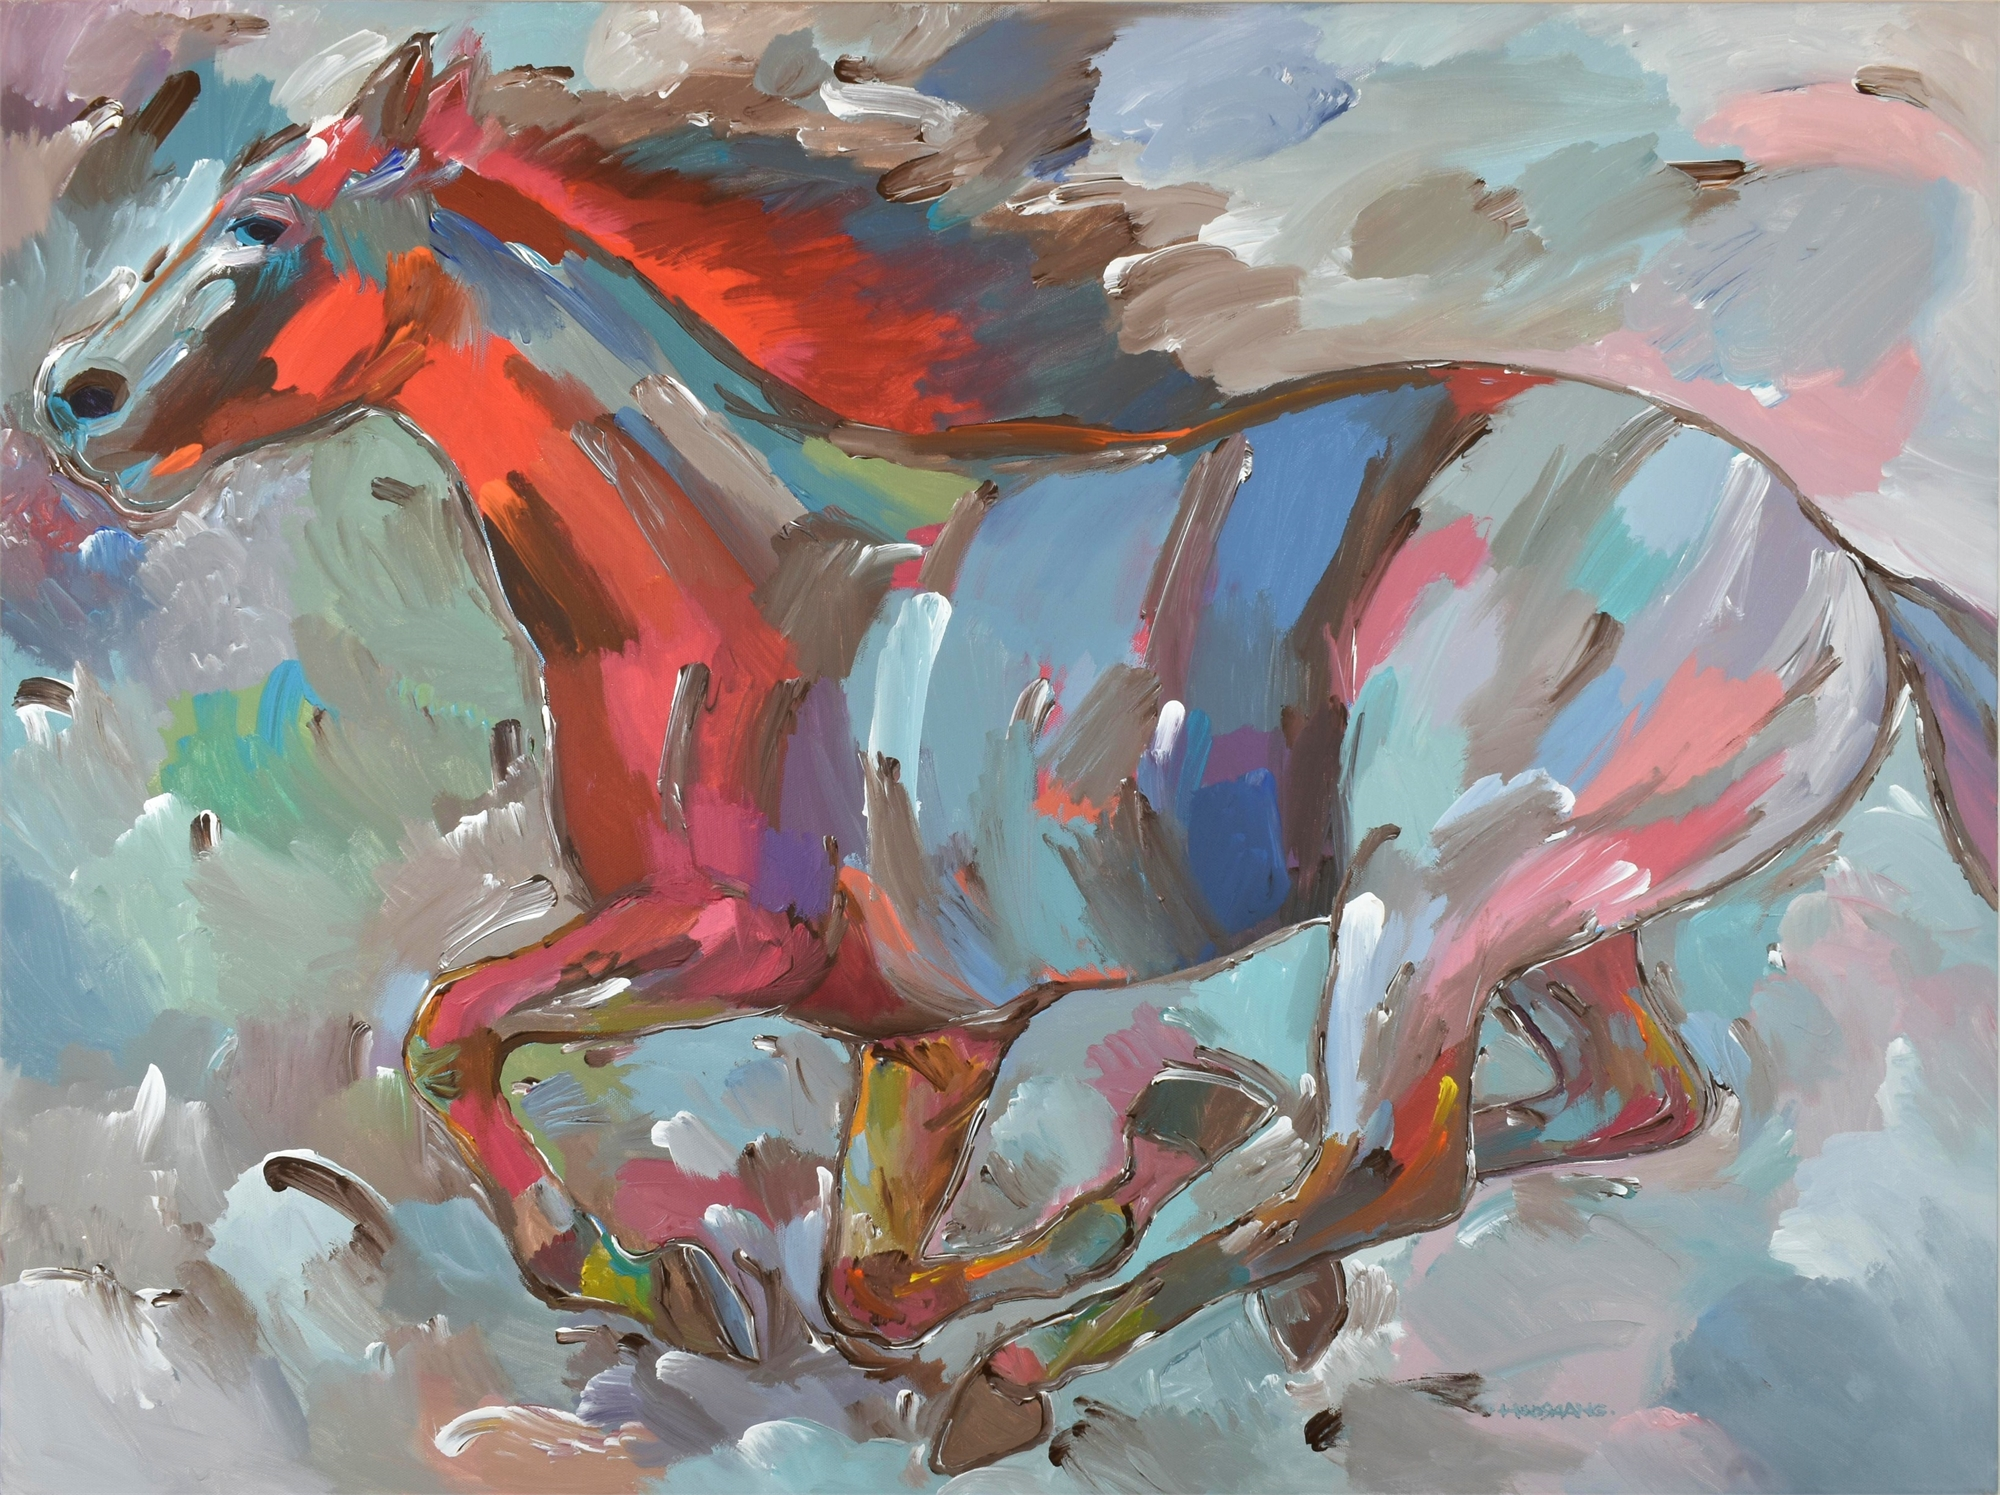 Fiery Runner by Hooshang Khorasani